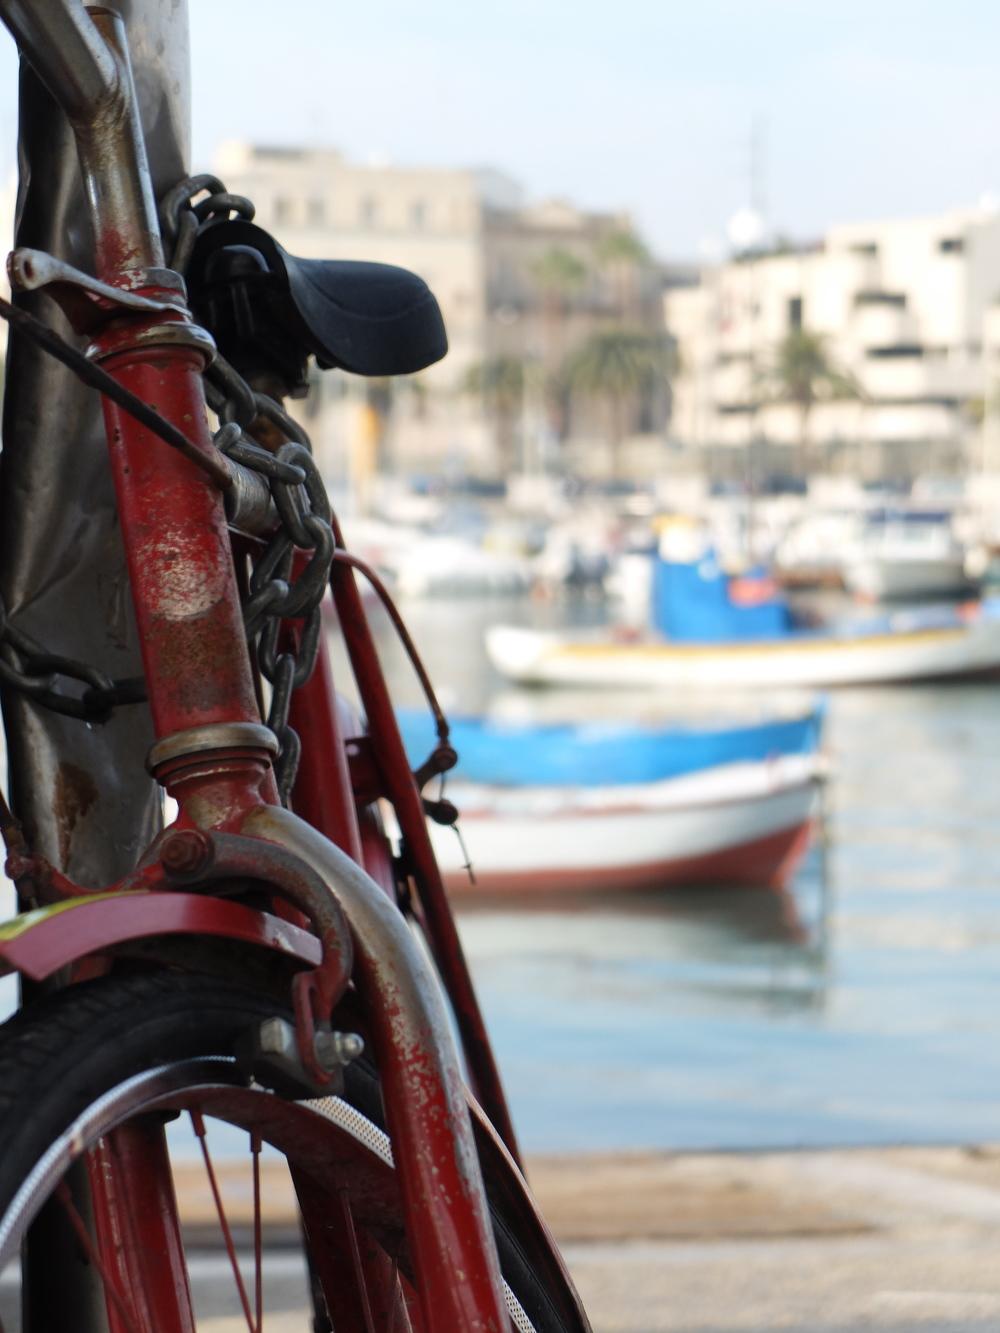 Bicycle, Bari, Italy